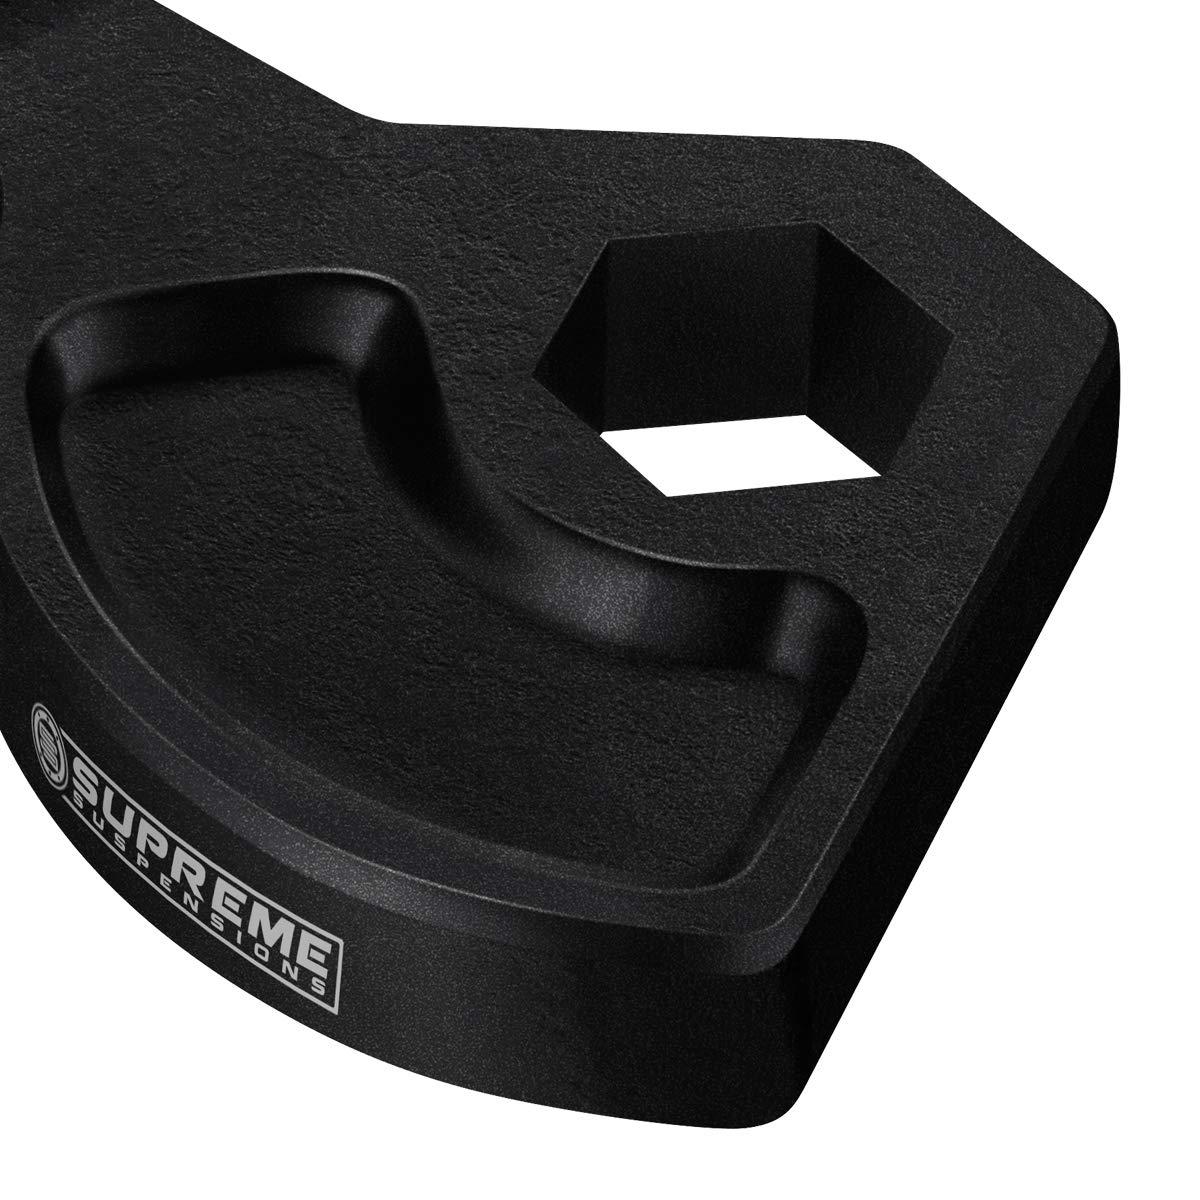 "Supreme Suspensions - Front Leveling Kit for Dodge Durango Adjustable 1"" to 3"" Front Lift Carbon Steel MAX-Torsion Dodge Durango Leveling Lift Kit 4WD 4x4 (Black) PRO"